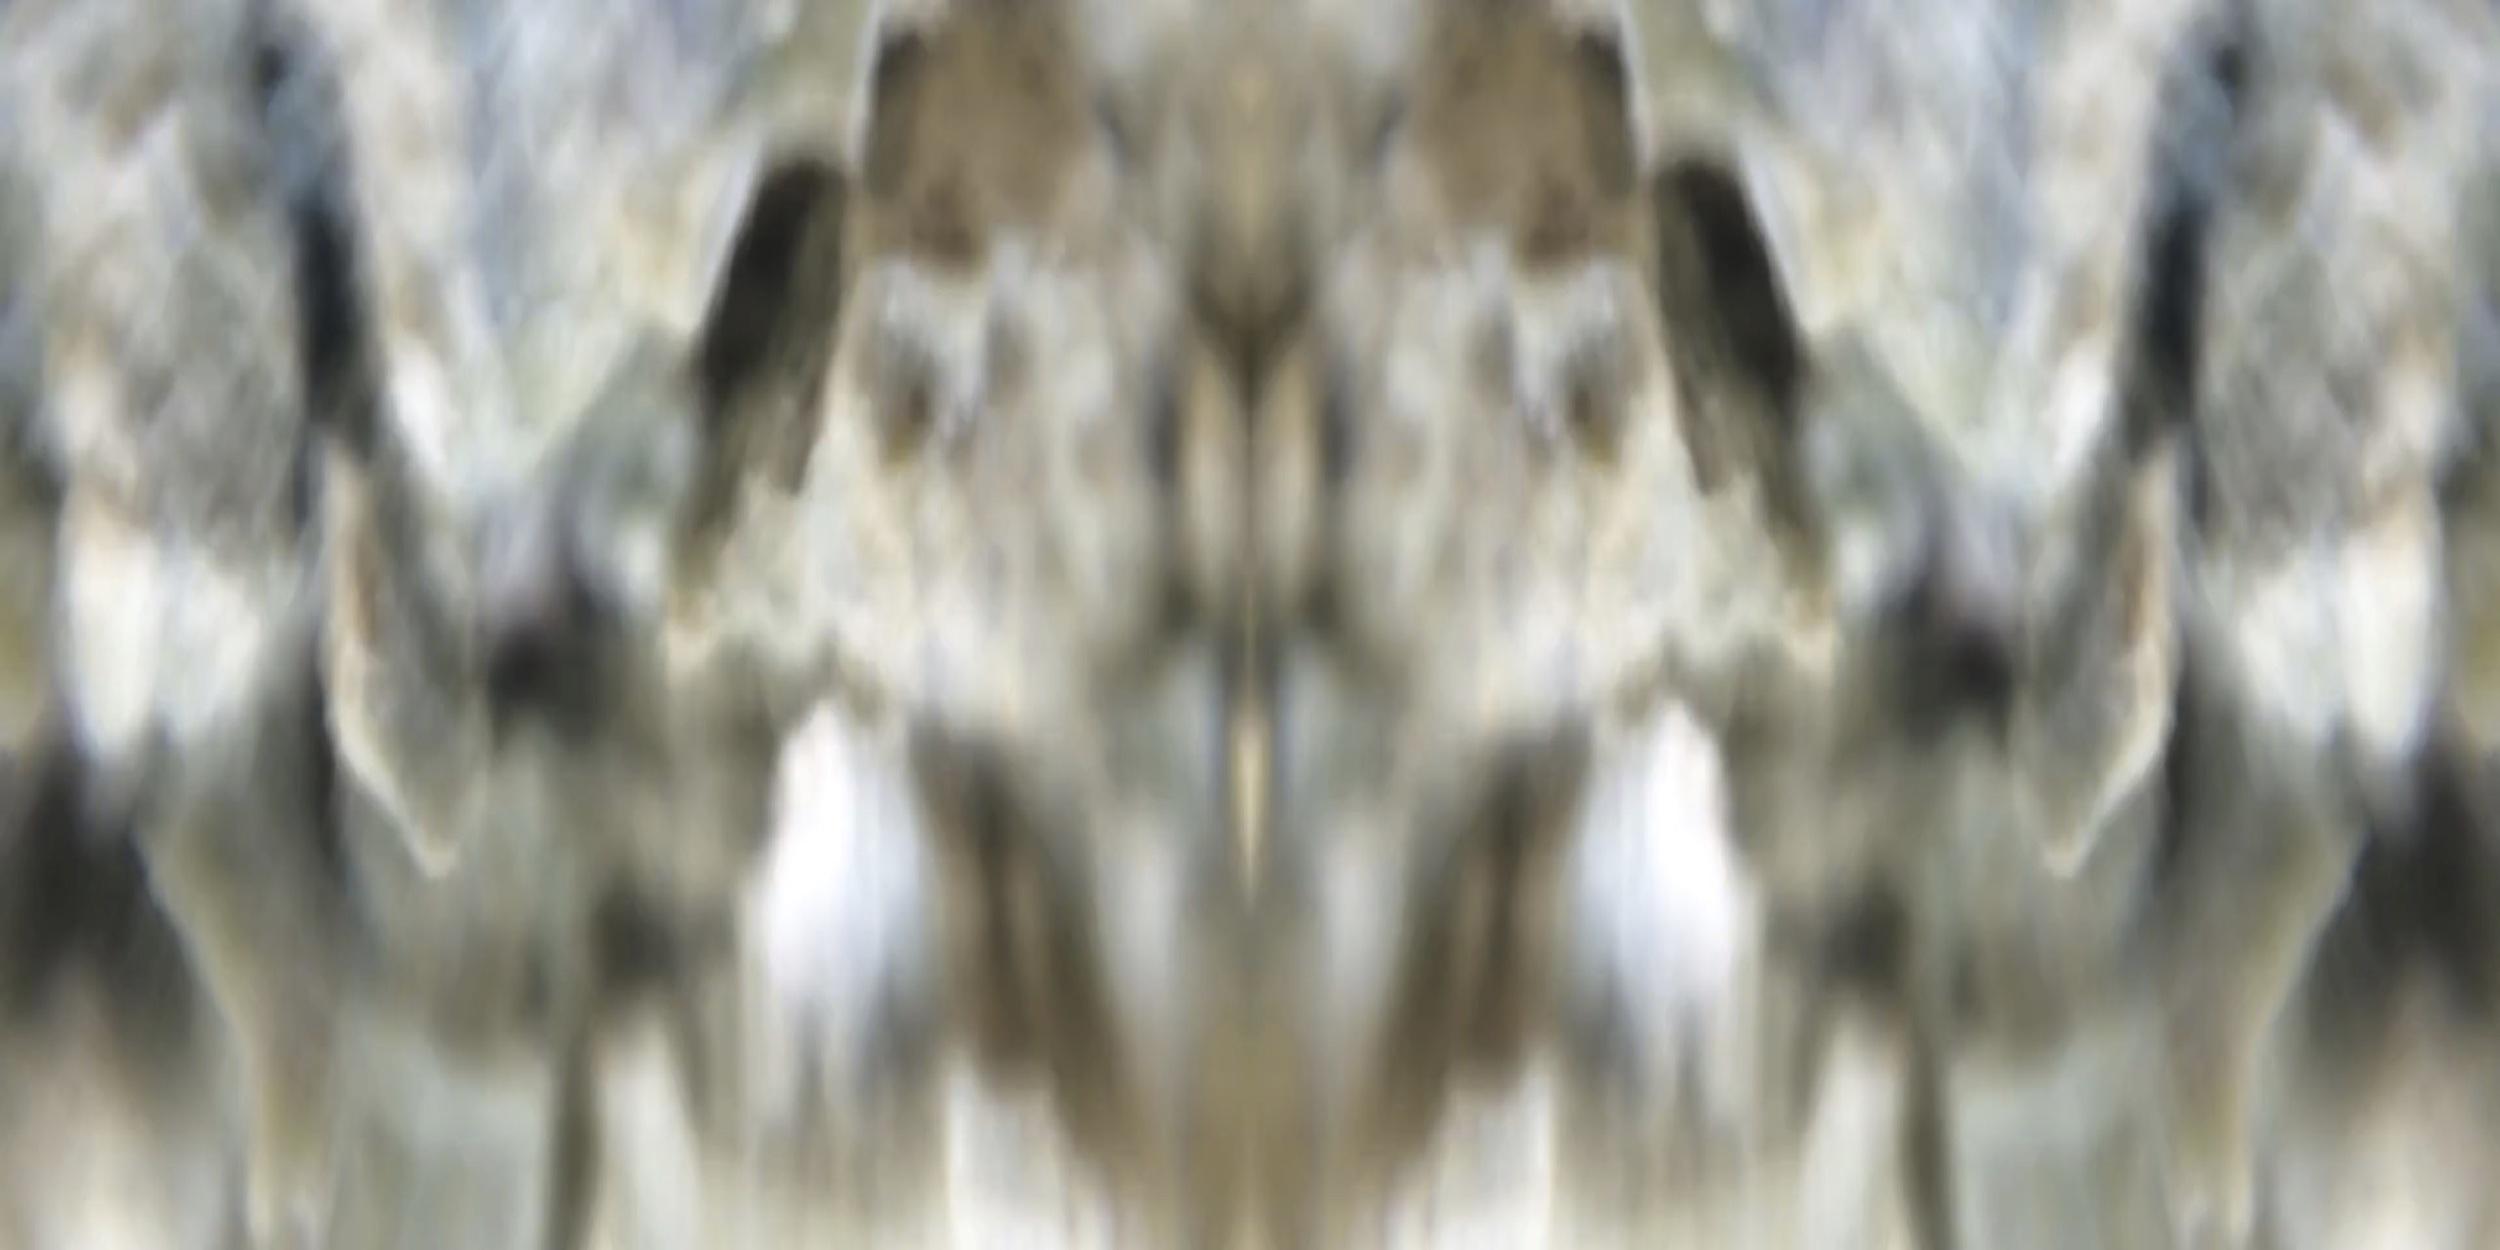 002-13_SiteReciprocity_MintChipCity.jpg